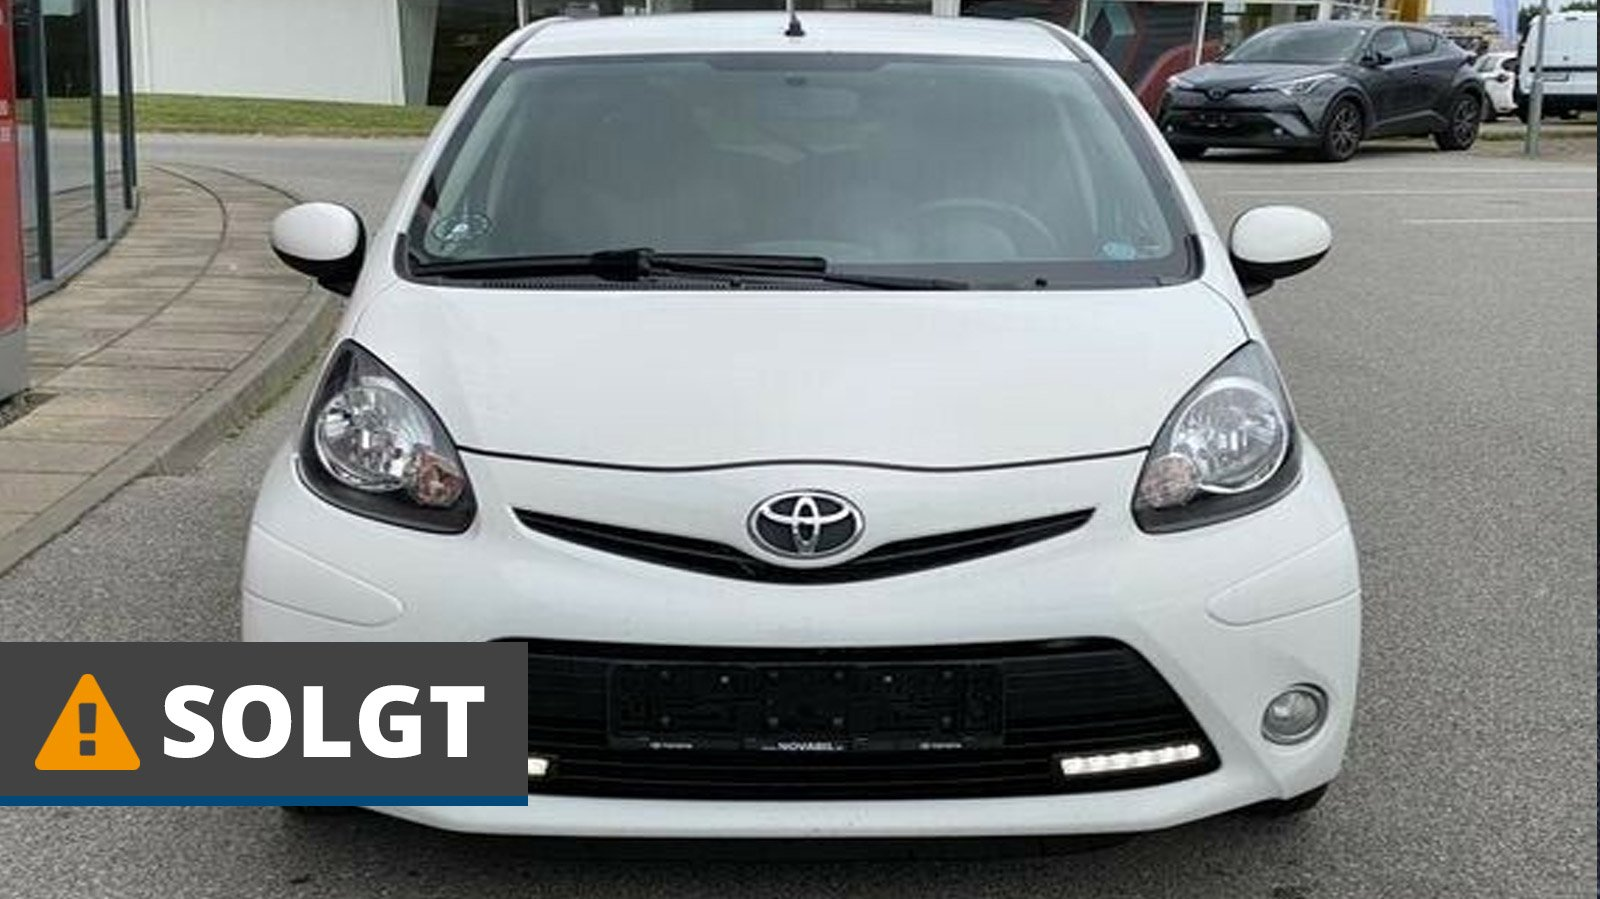 Toyota Aygo VVT-i T2 Air 1,0 Benzin 68 Hk (2012) // SOLGT